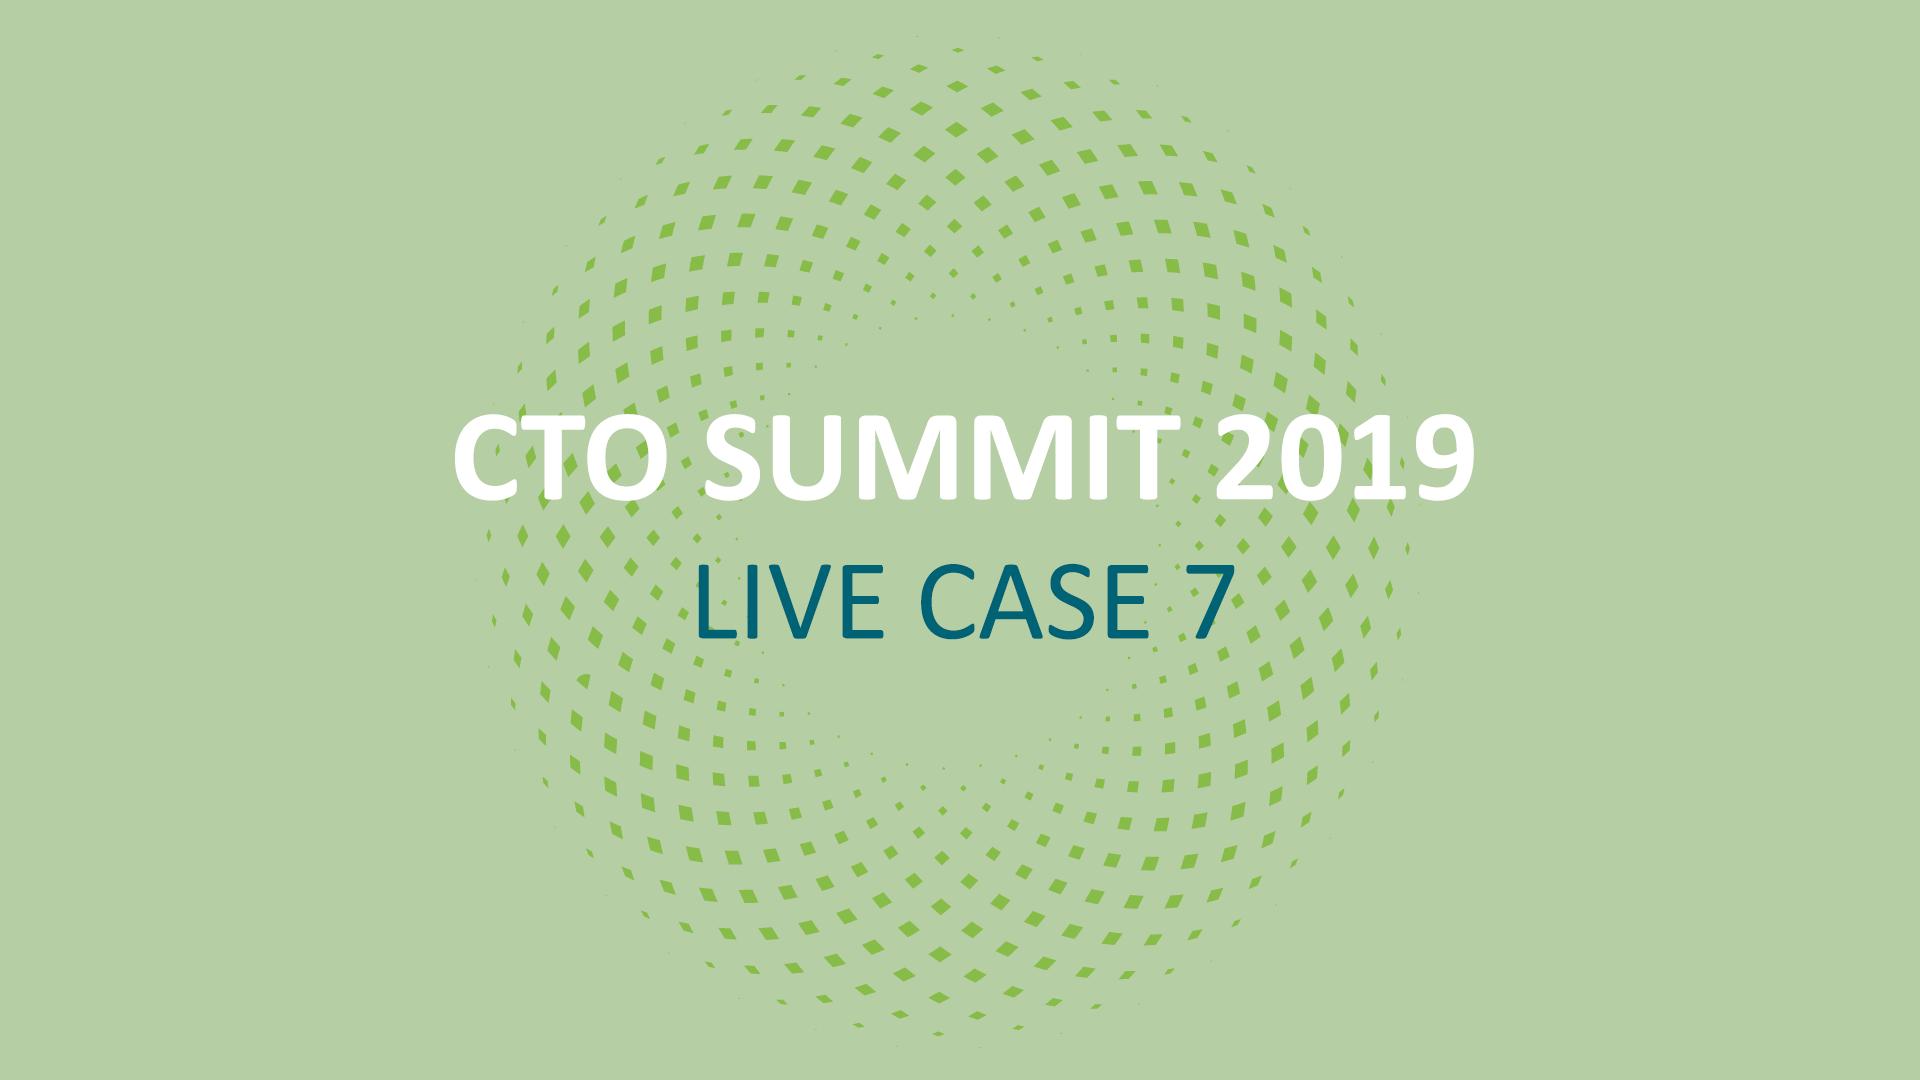 CTO SUMMIT 2019: Live Case 7